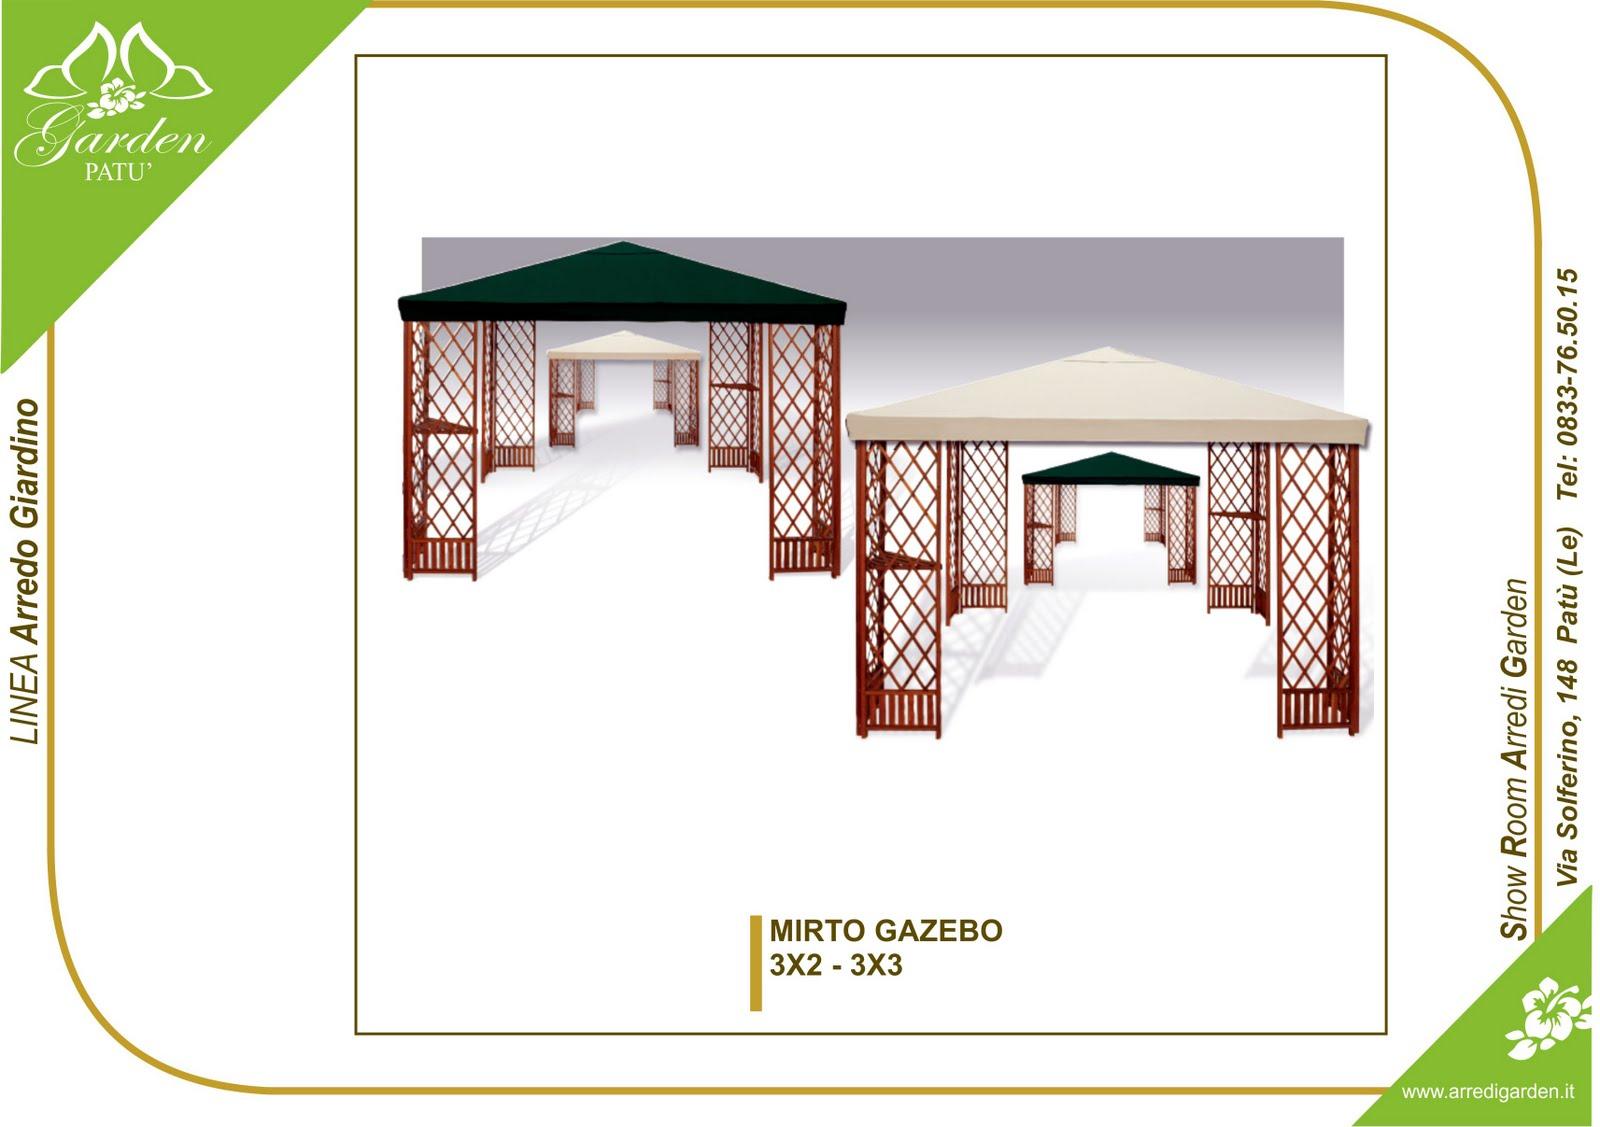 Arredo giardino italia arredo giardino pat tavoli in for Arredo giardino milano